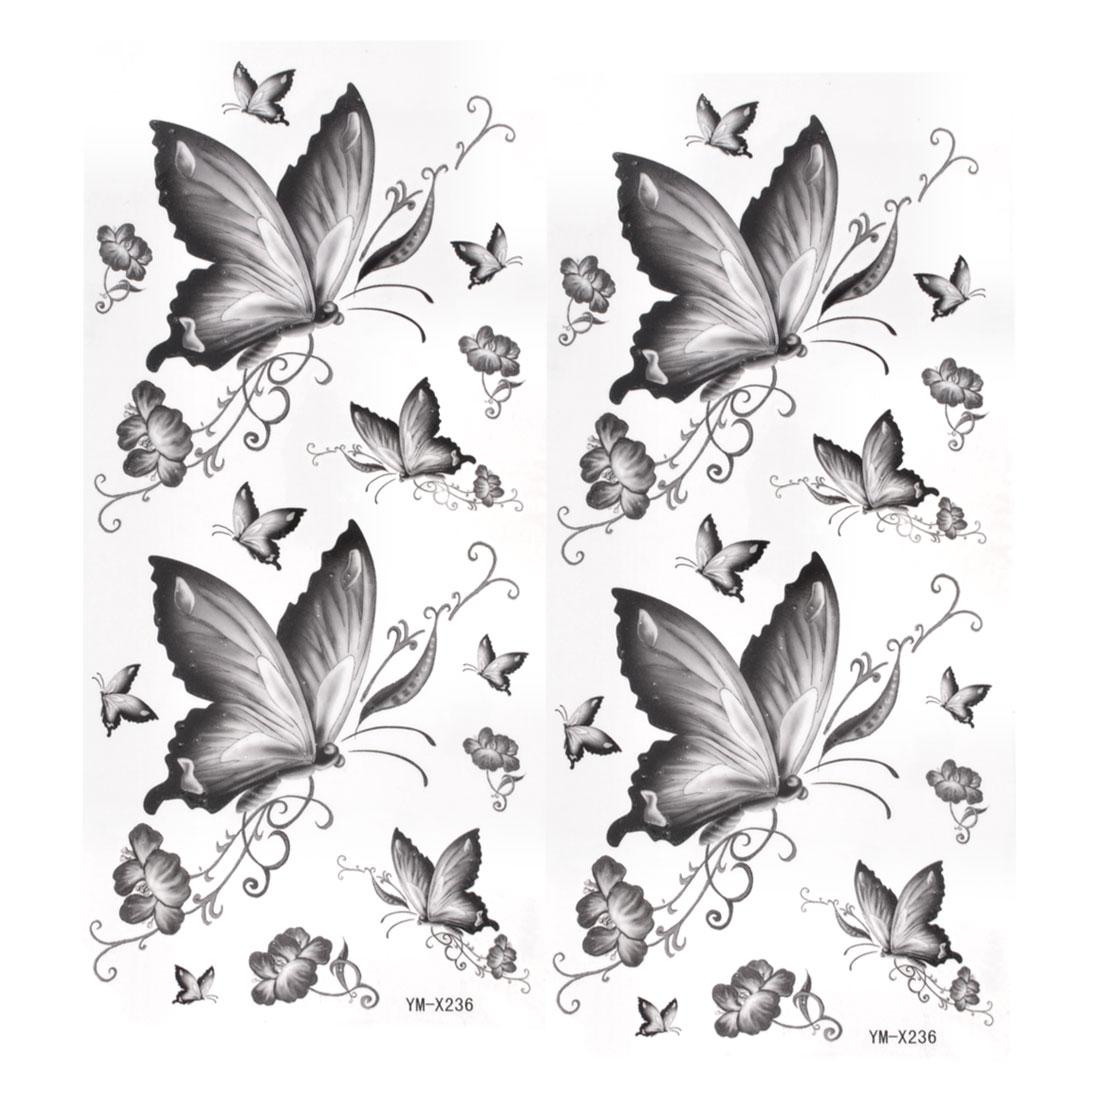 2pcs Dark Gray Butterfly Print Temporary Transfer Tribal Tattoos Beauty Stickers